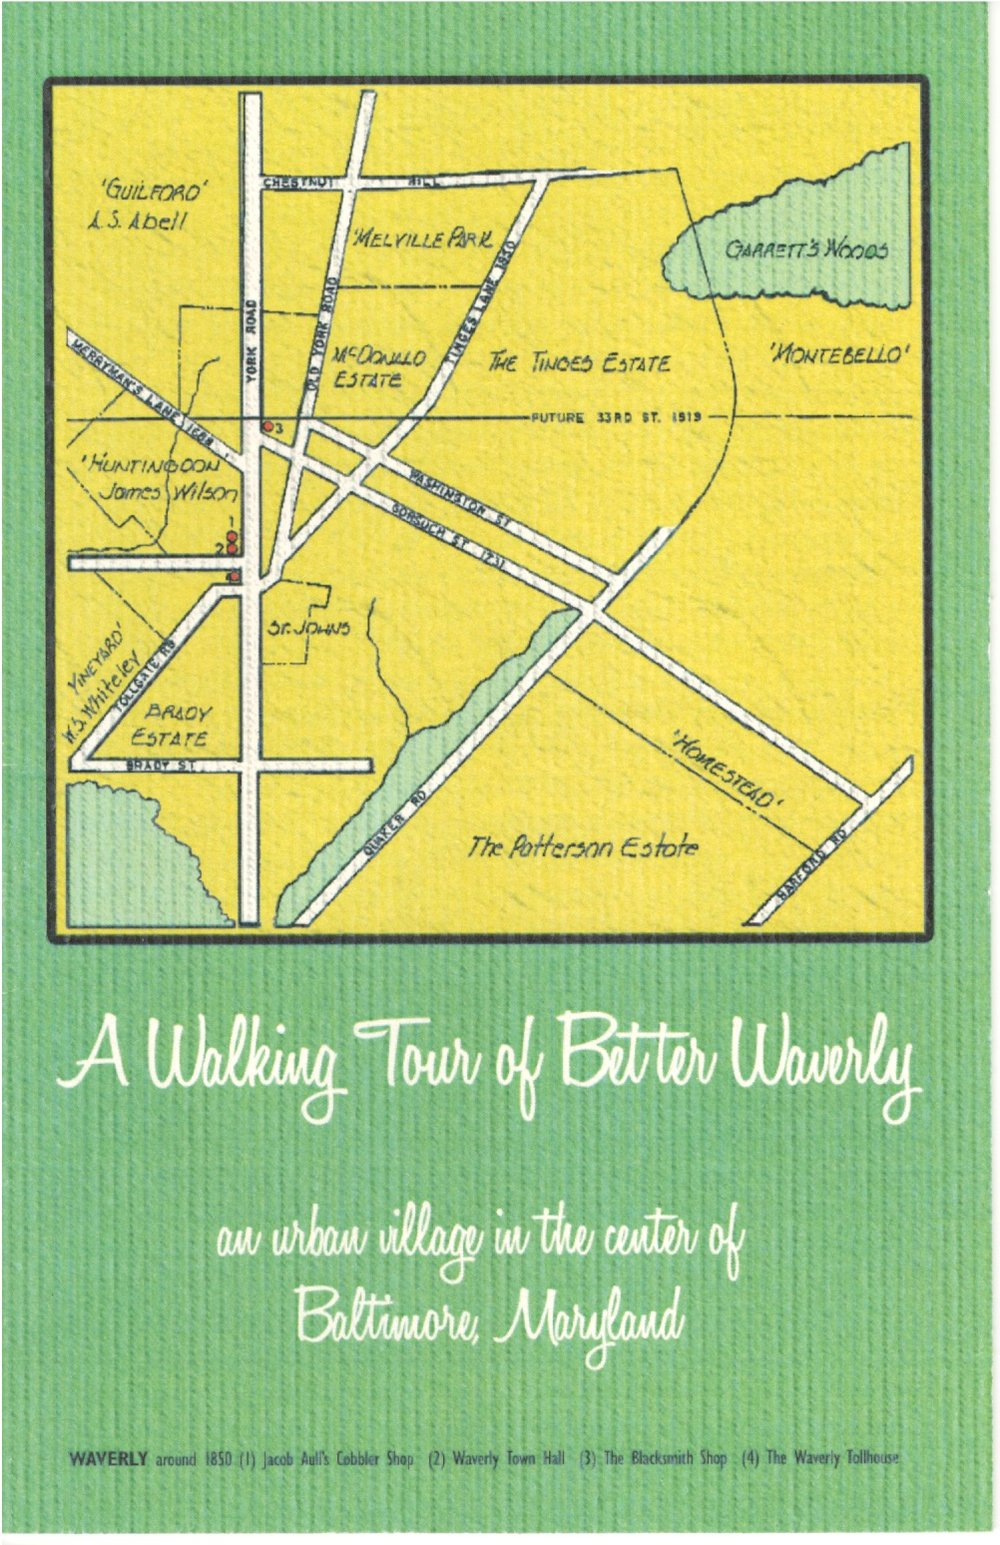 A Walking Tour of Better Waverly